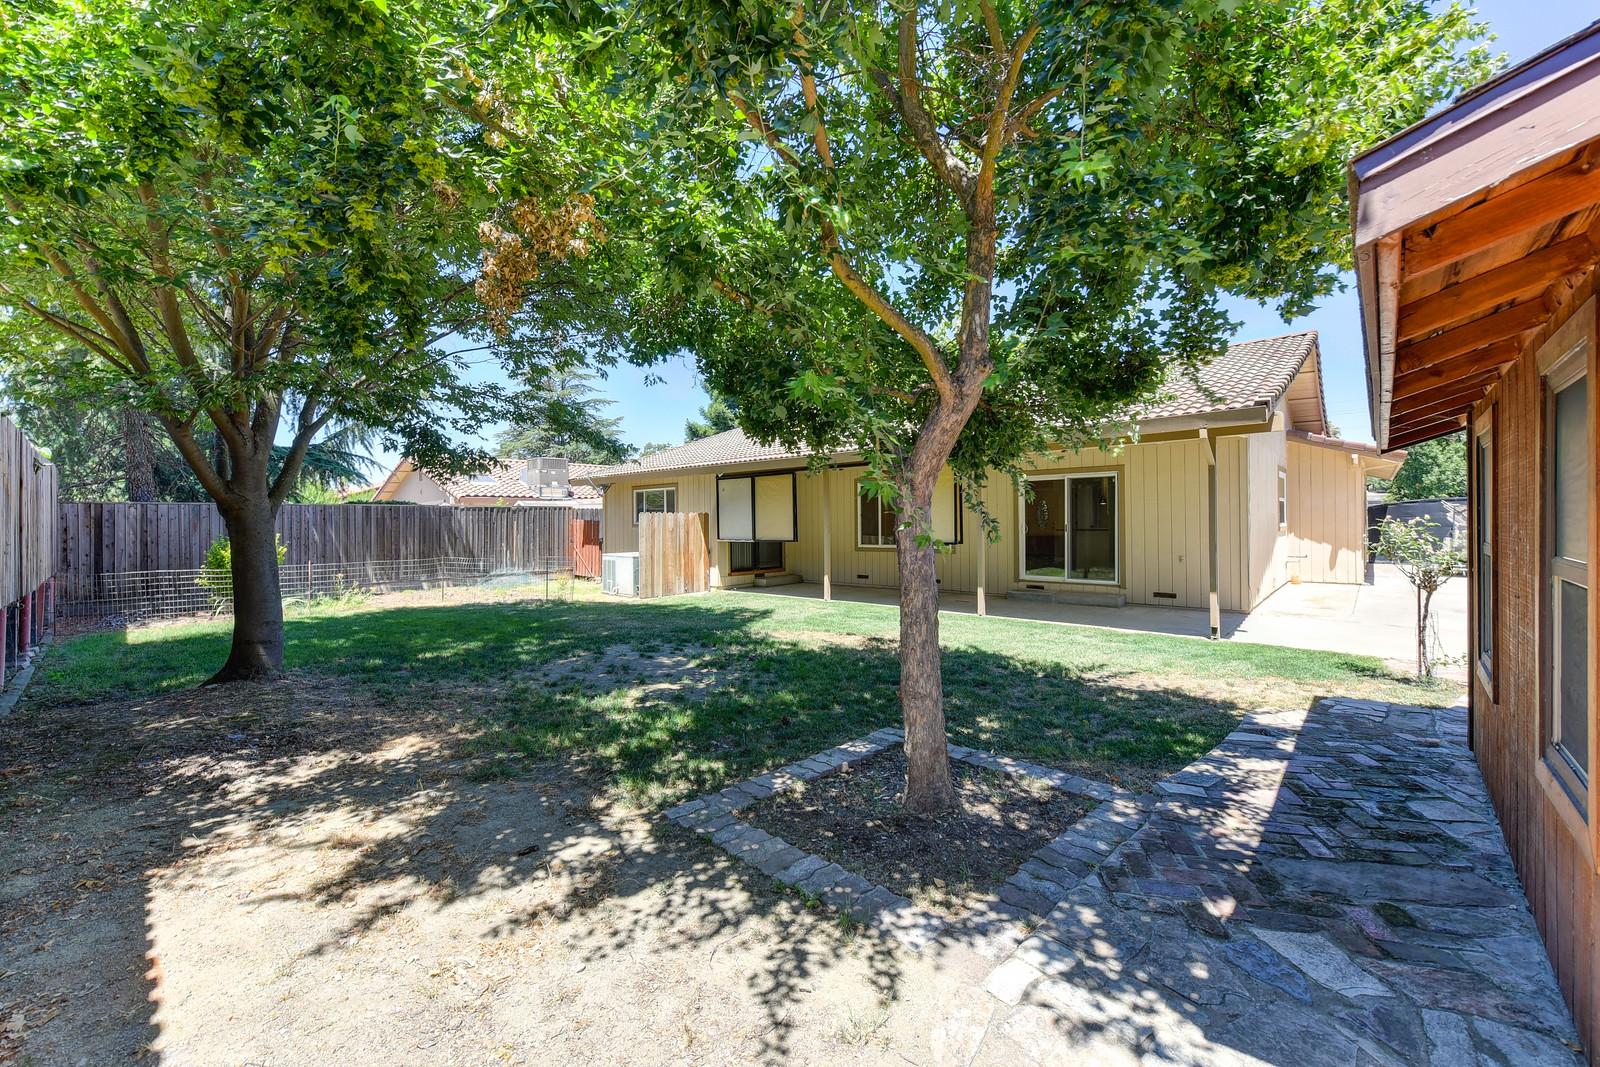 Backyard at 5342 Nyoda Way Carmichael California | Carmichael Real Estate Agent